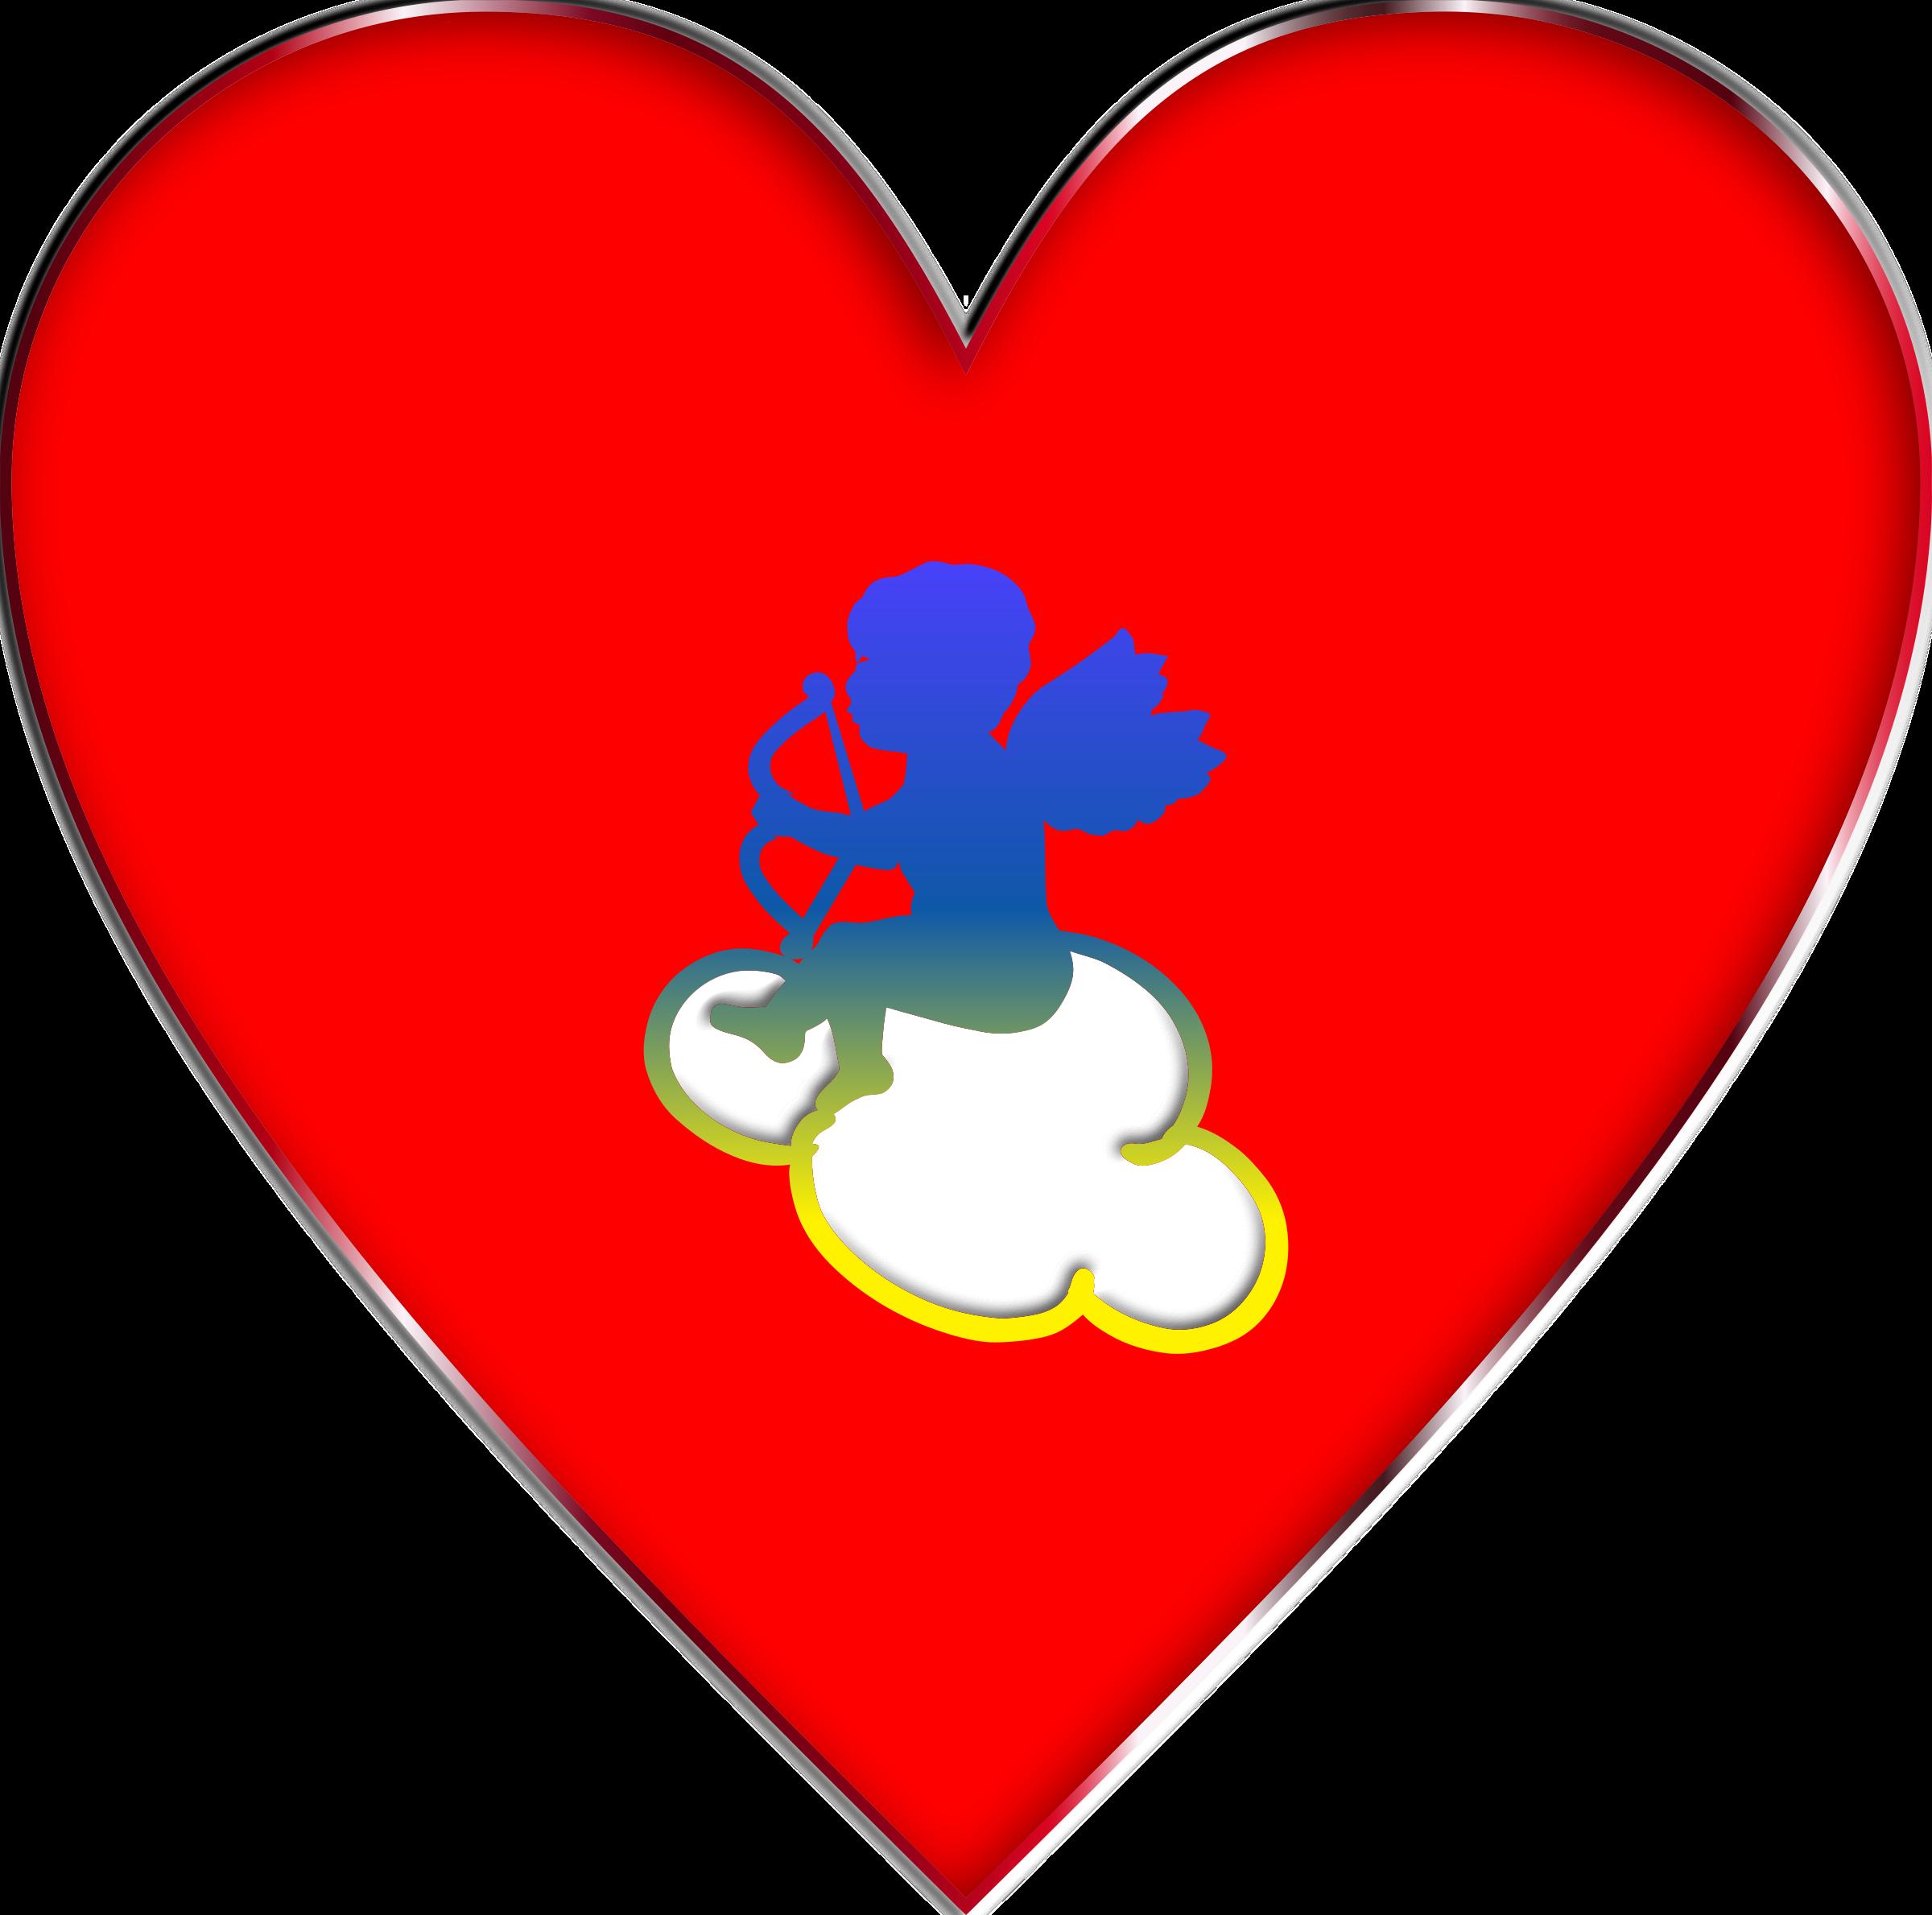 cupid heart clipart #8